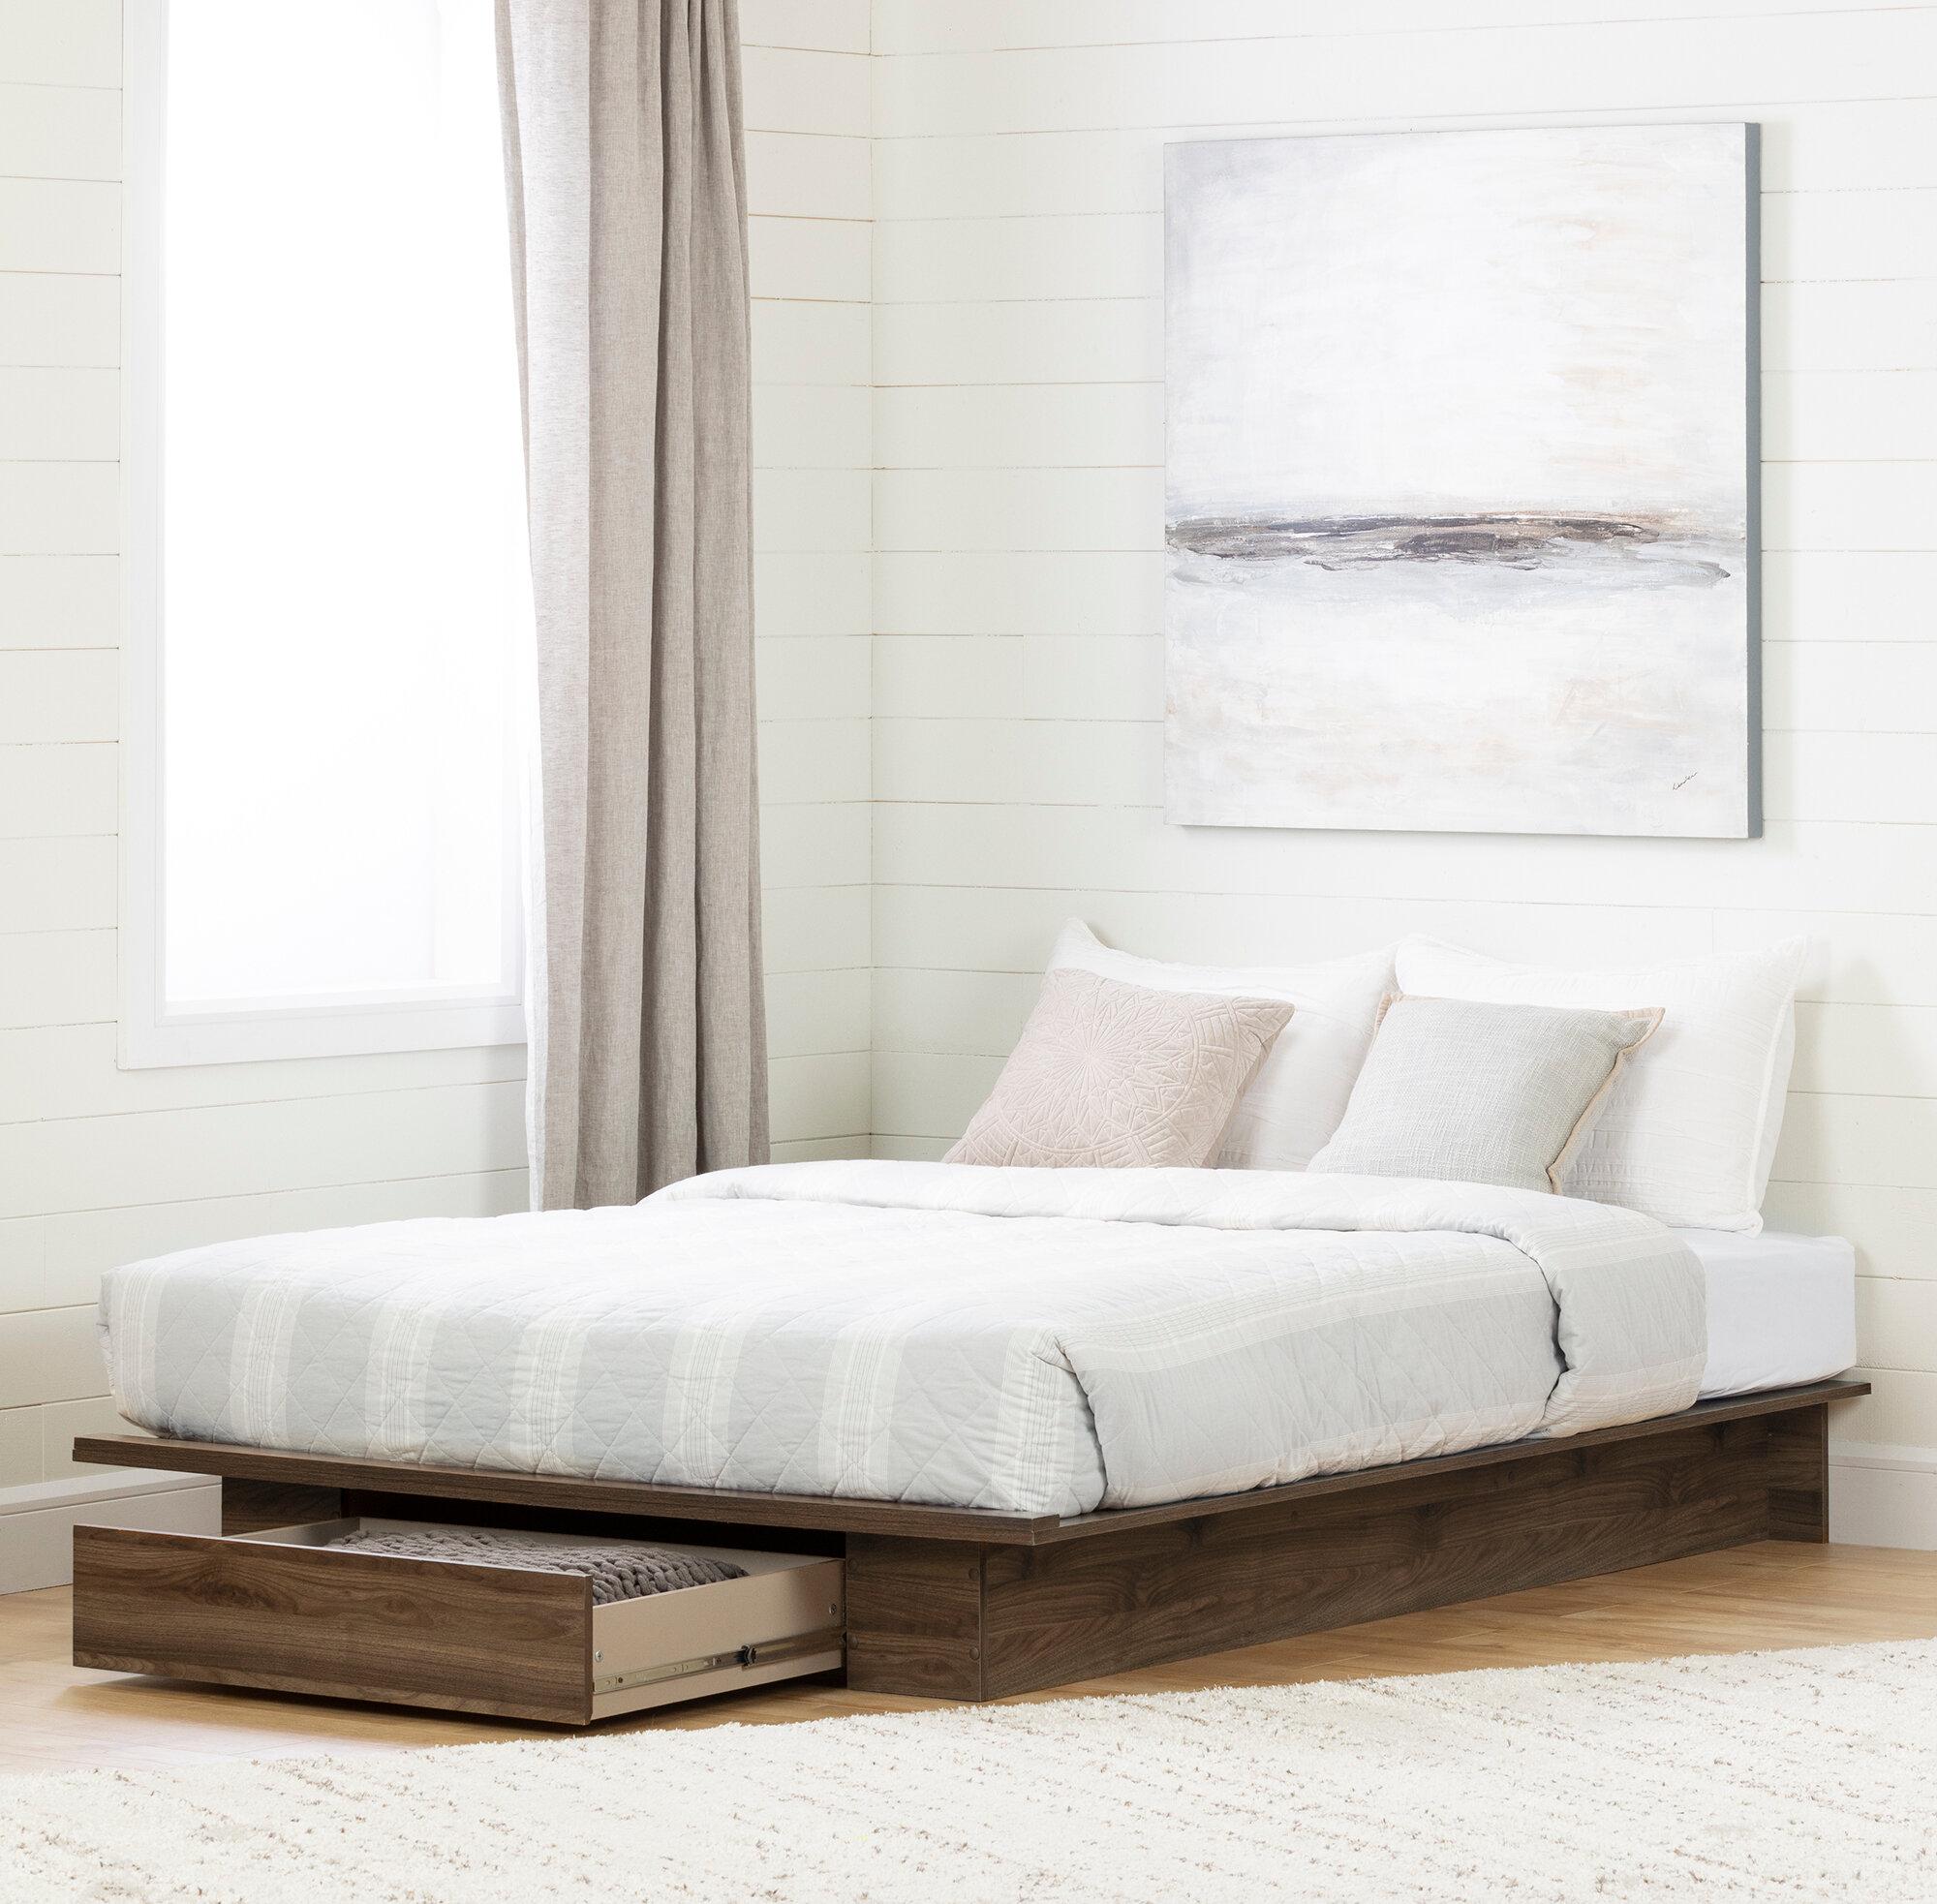 South Shore Tao Queen Storage Platform Bed Reviews Wayfair